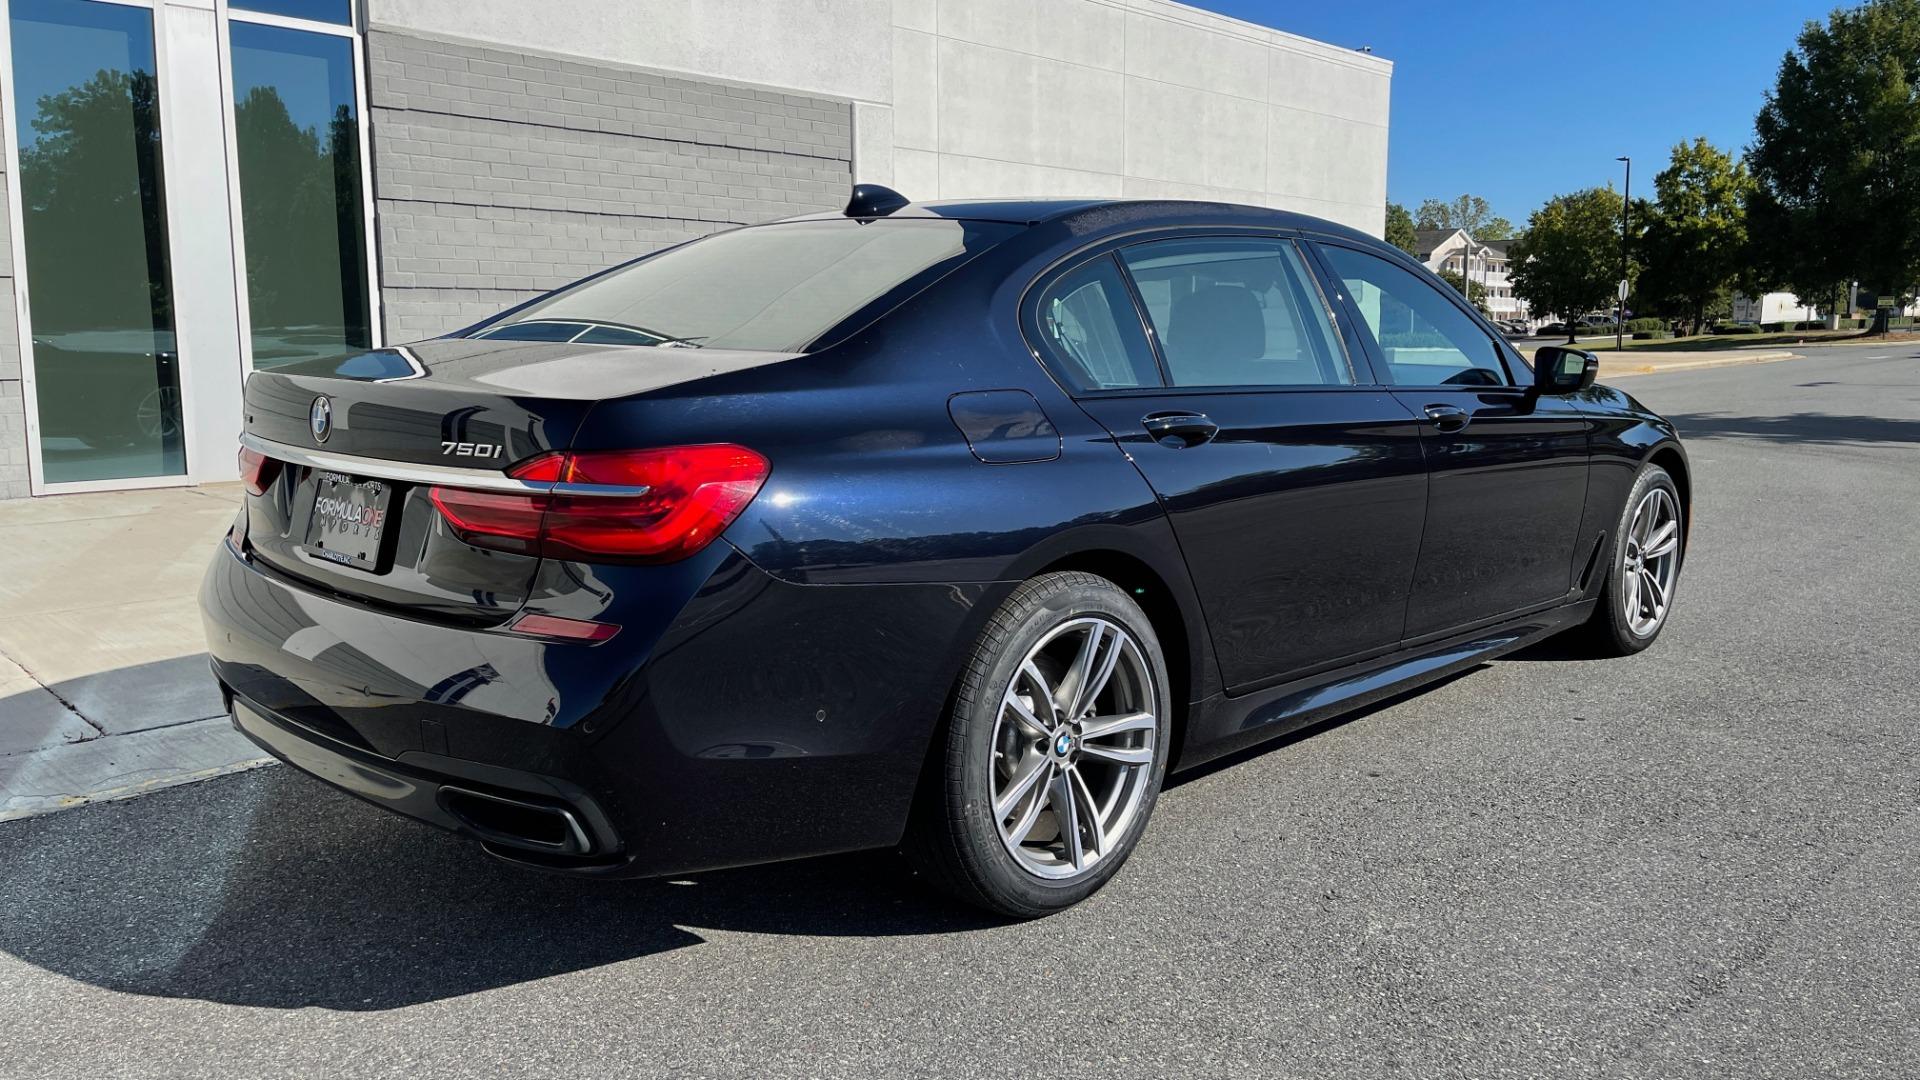 Used 2019 BMW 7 SERIES 750I XDRIVE M-SPORT / EXEC PKG / DRVR ASST PLUS / CLD WTHR / PAR for sale $60,995 at Formula Imports in Charlotte NC 28227 2